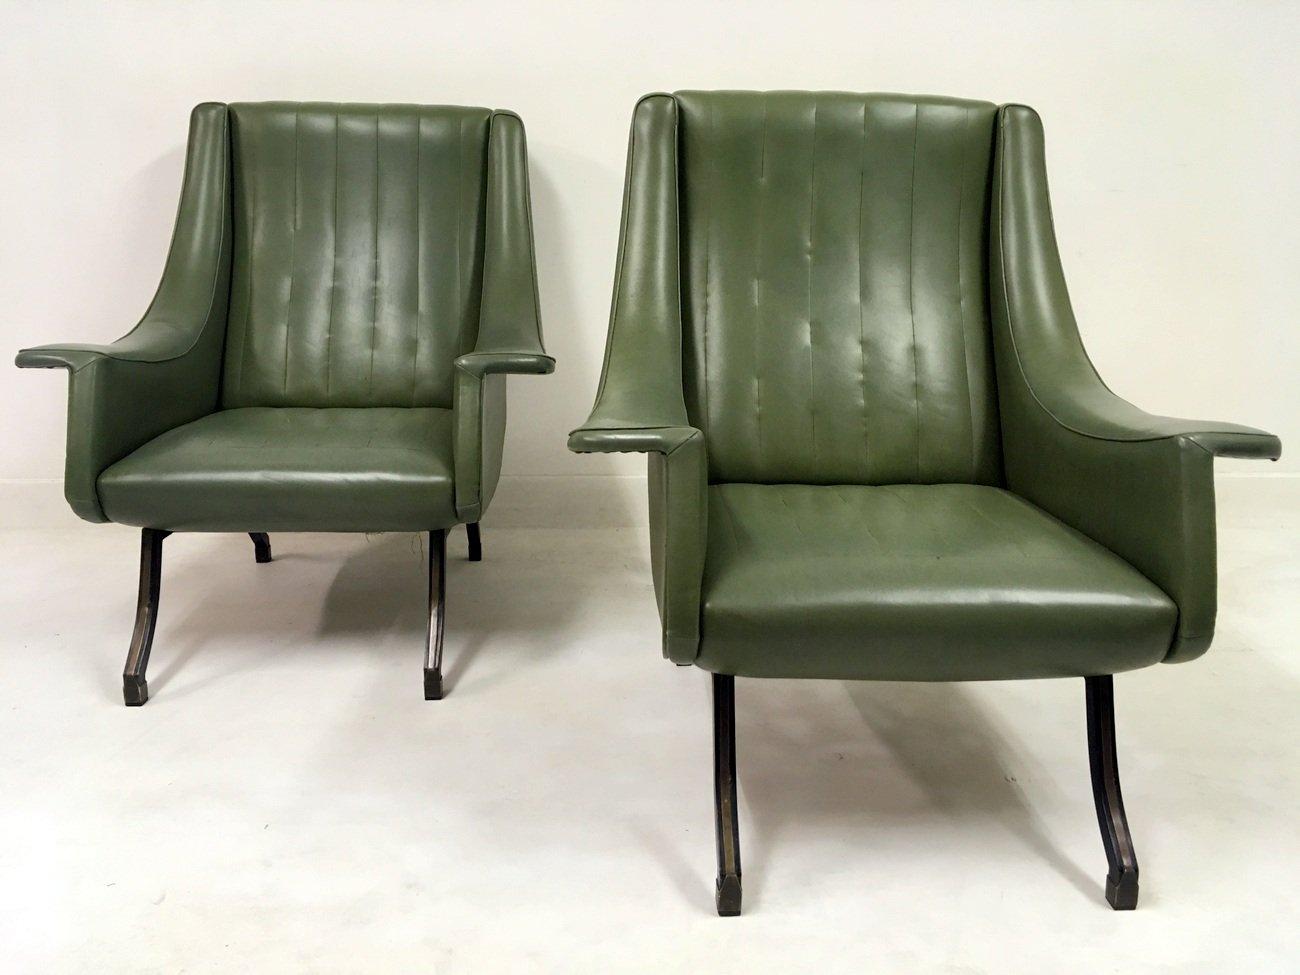 Italienische sessel mit f en aus metall 1960er 2er set for Sessel italienisches design